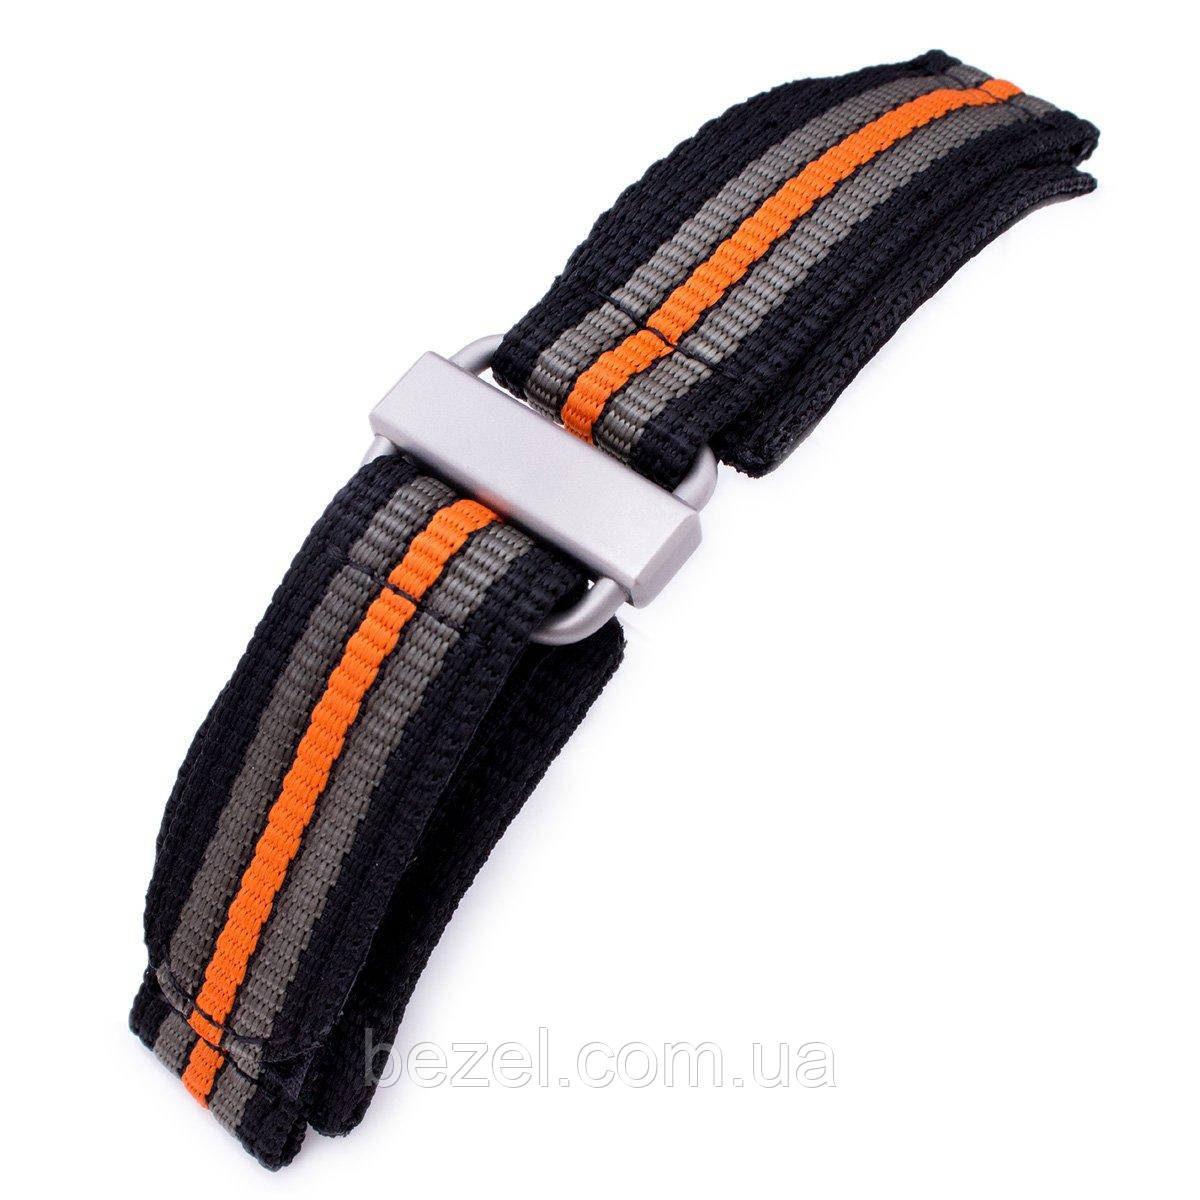 22mm MiLTAT Black, Khaki & Orange Stripes 3-D Nylon Velcro Fastener Watch Strap, Sandblasted Buckle